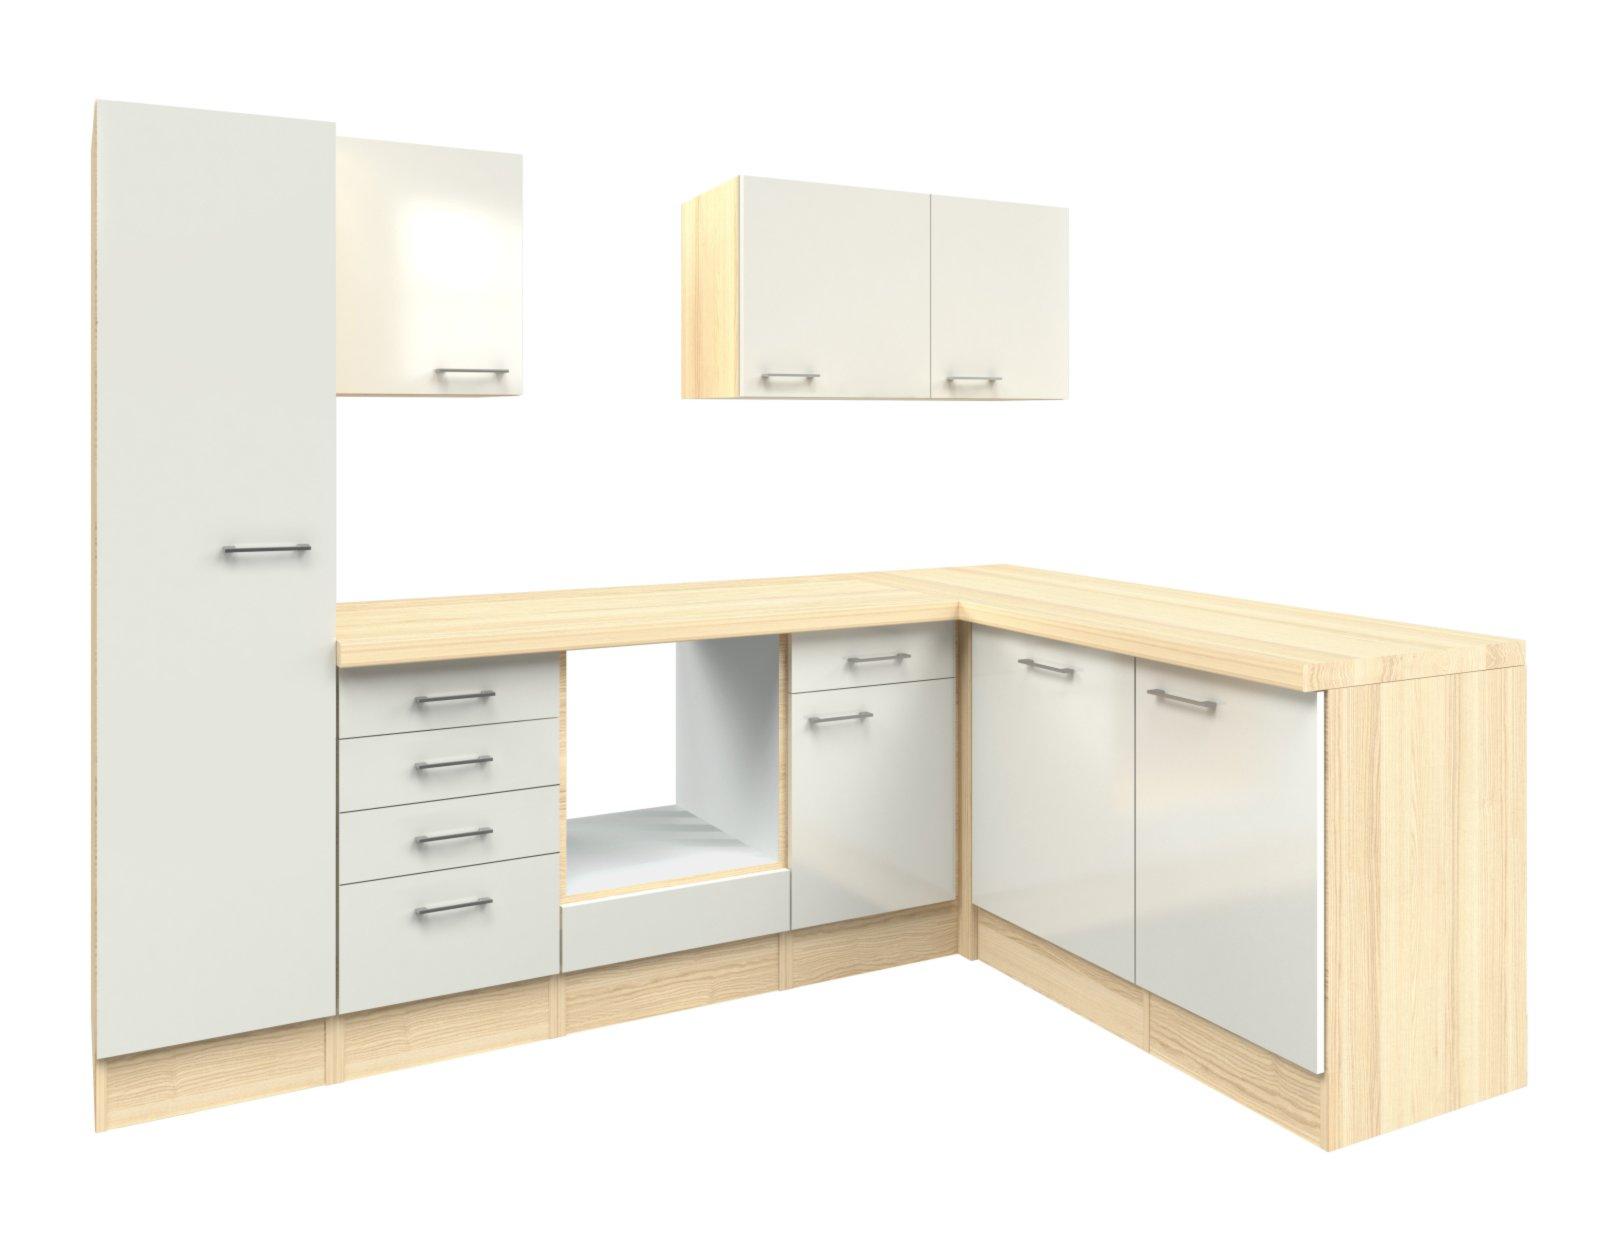 winkelk che abaco perlmutt akazie 270x170 cm. Black Bedroom Furniture Sets. Home Design Ideas